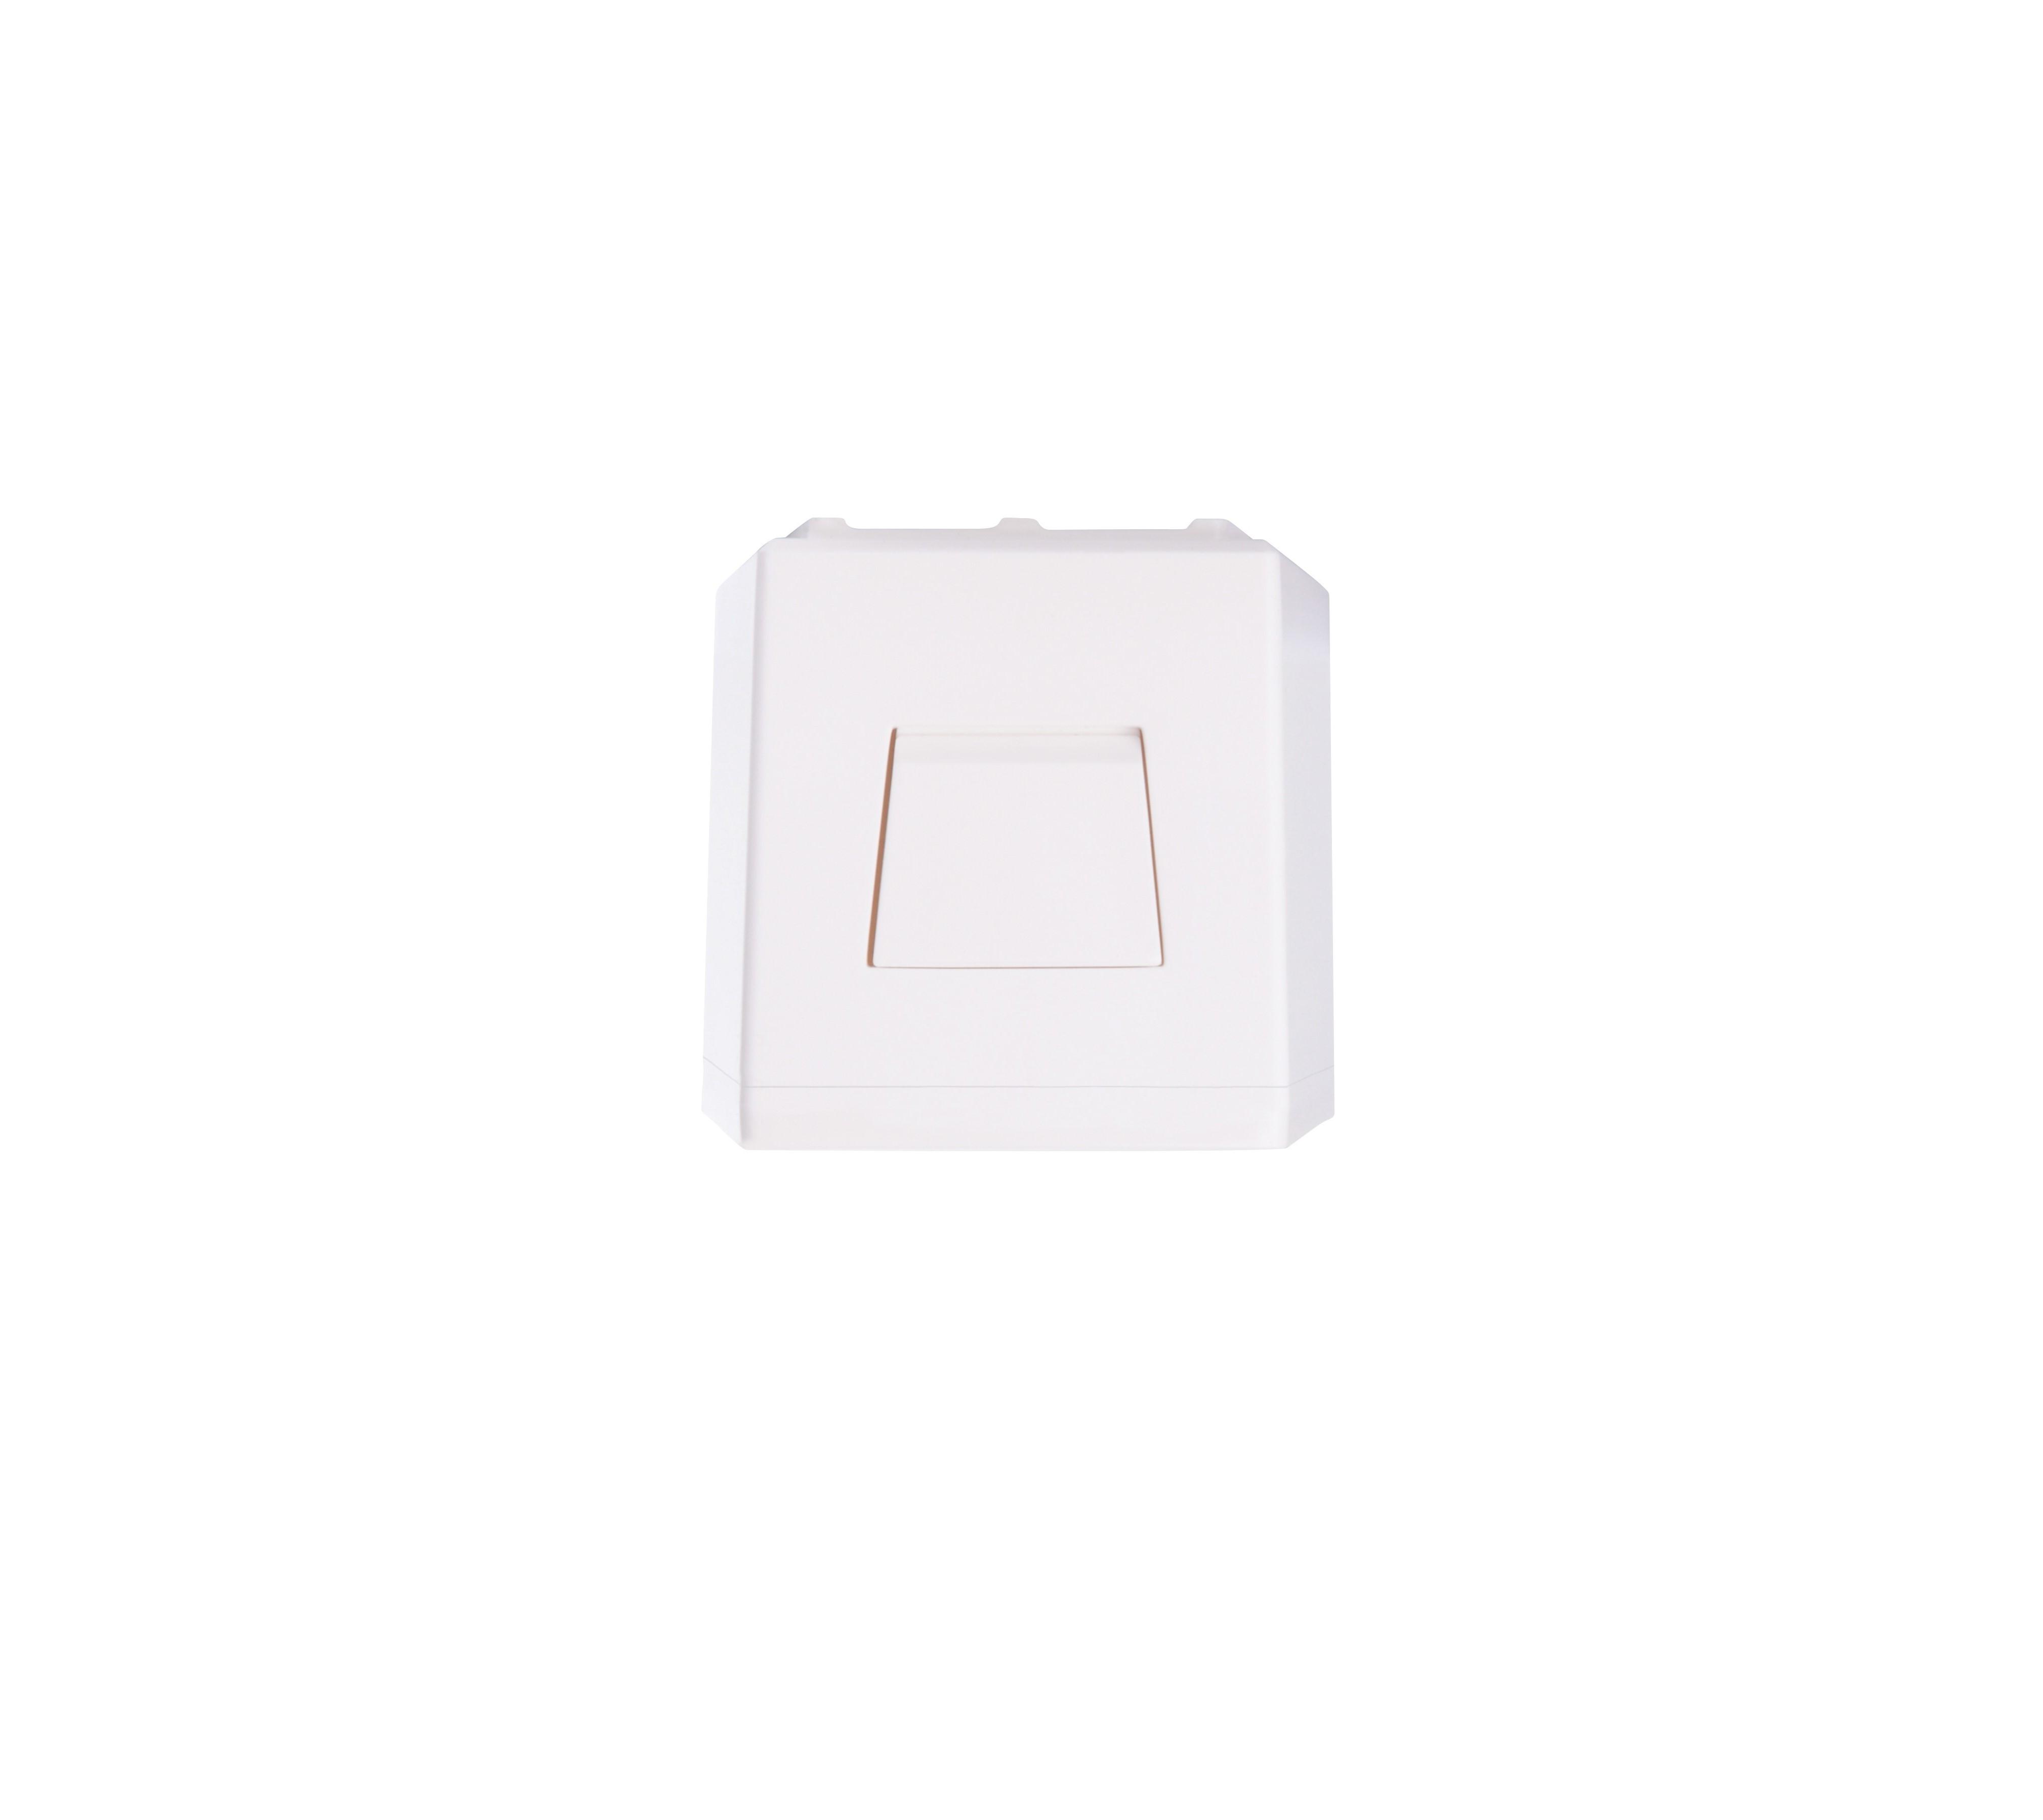 Lampa emergenta led Intelight 94706   3h mentinut test automat 1